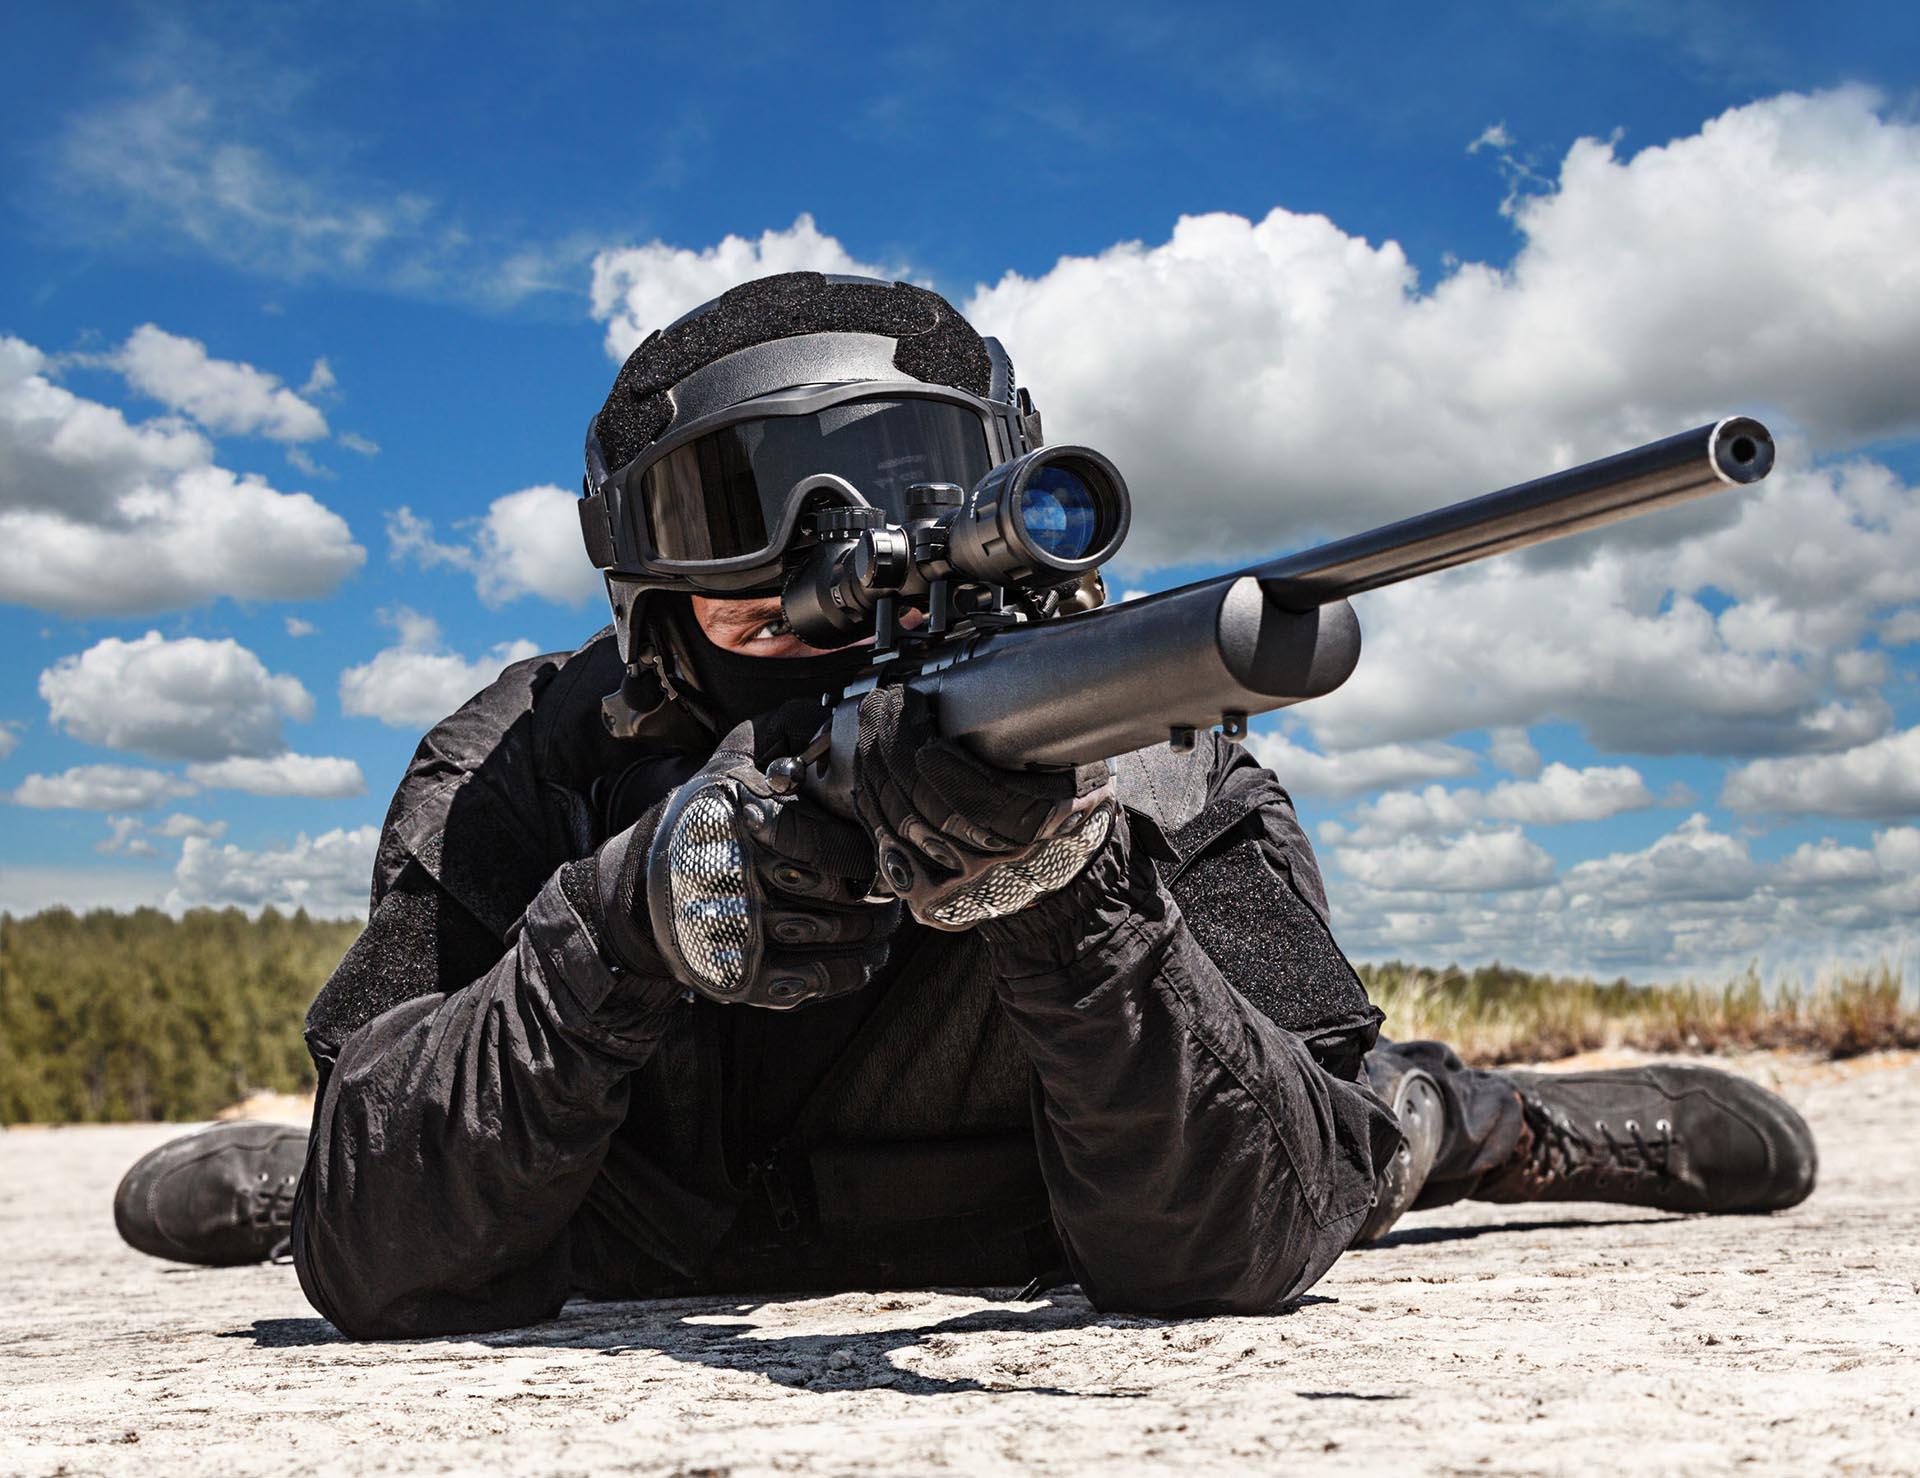 46189366 Police Sniper Swat In Black Uniform In Action Safeshoot